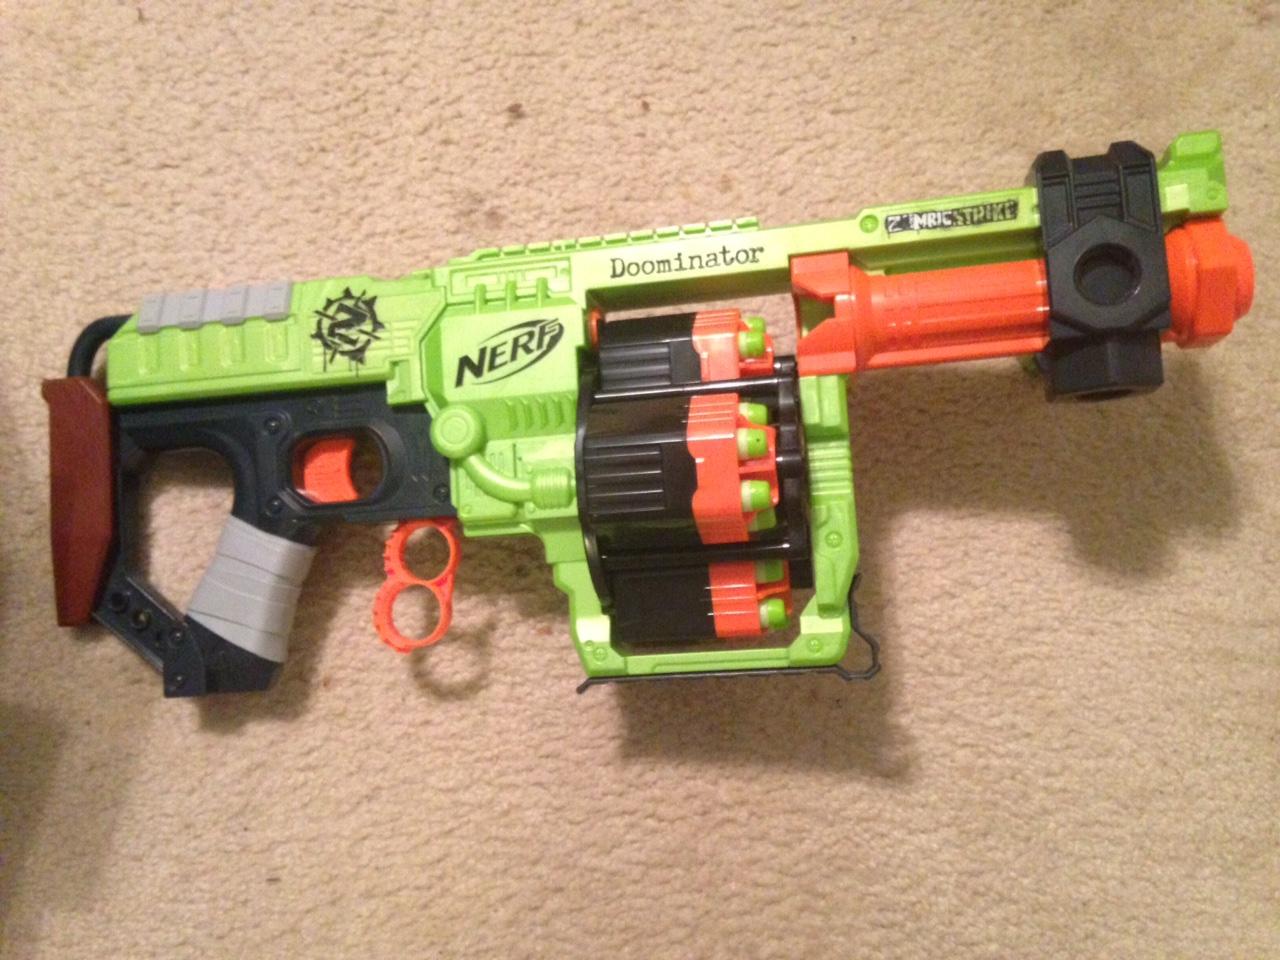 NERF Zombie Strike – Doominator